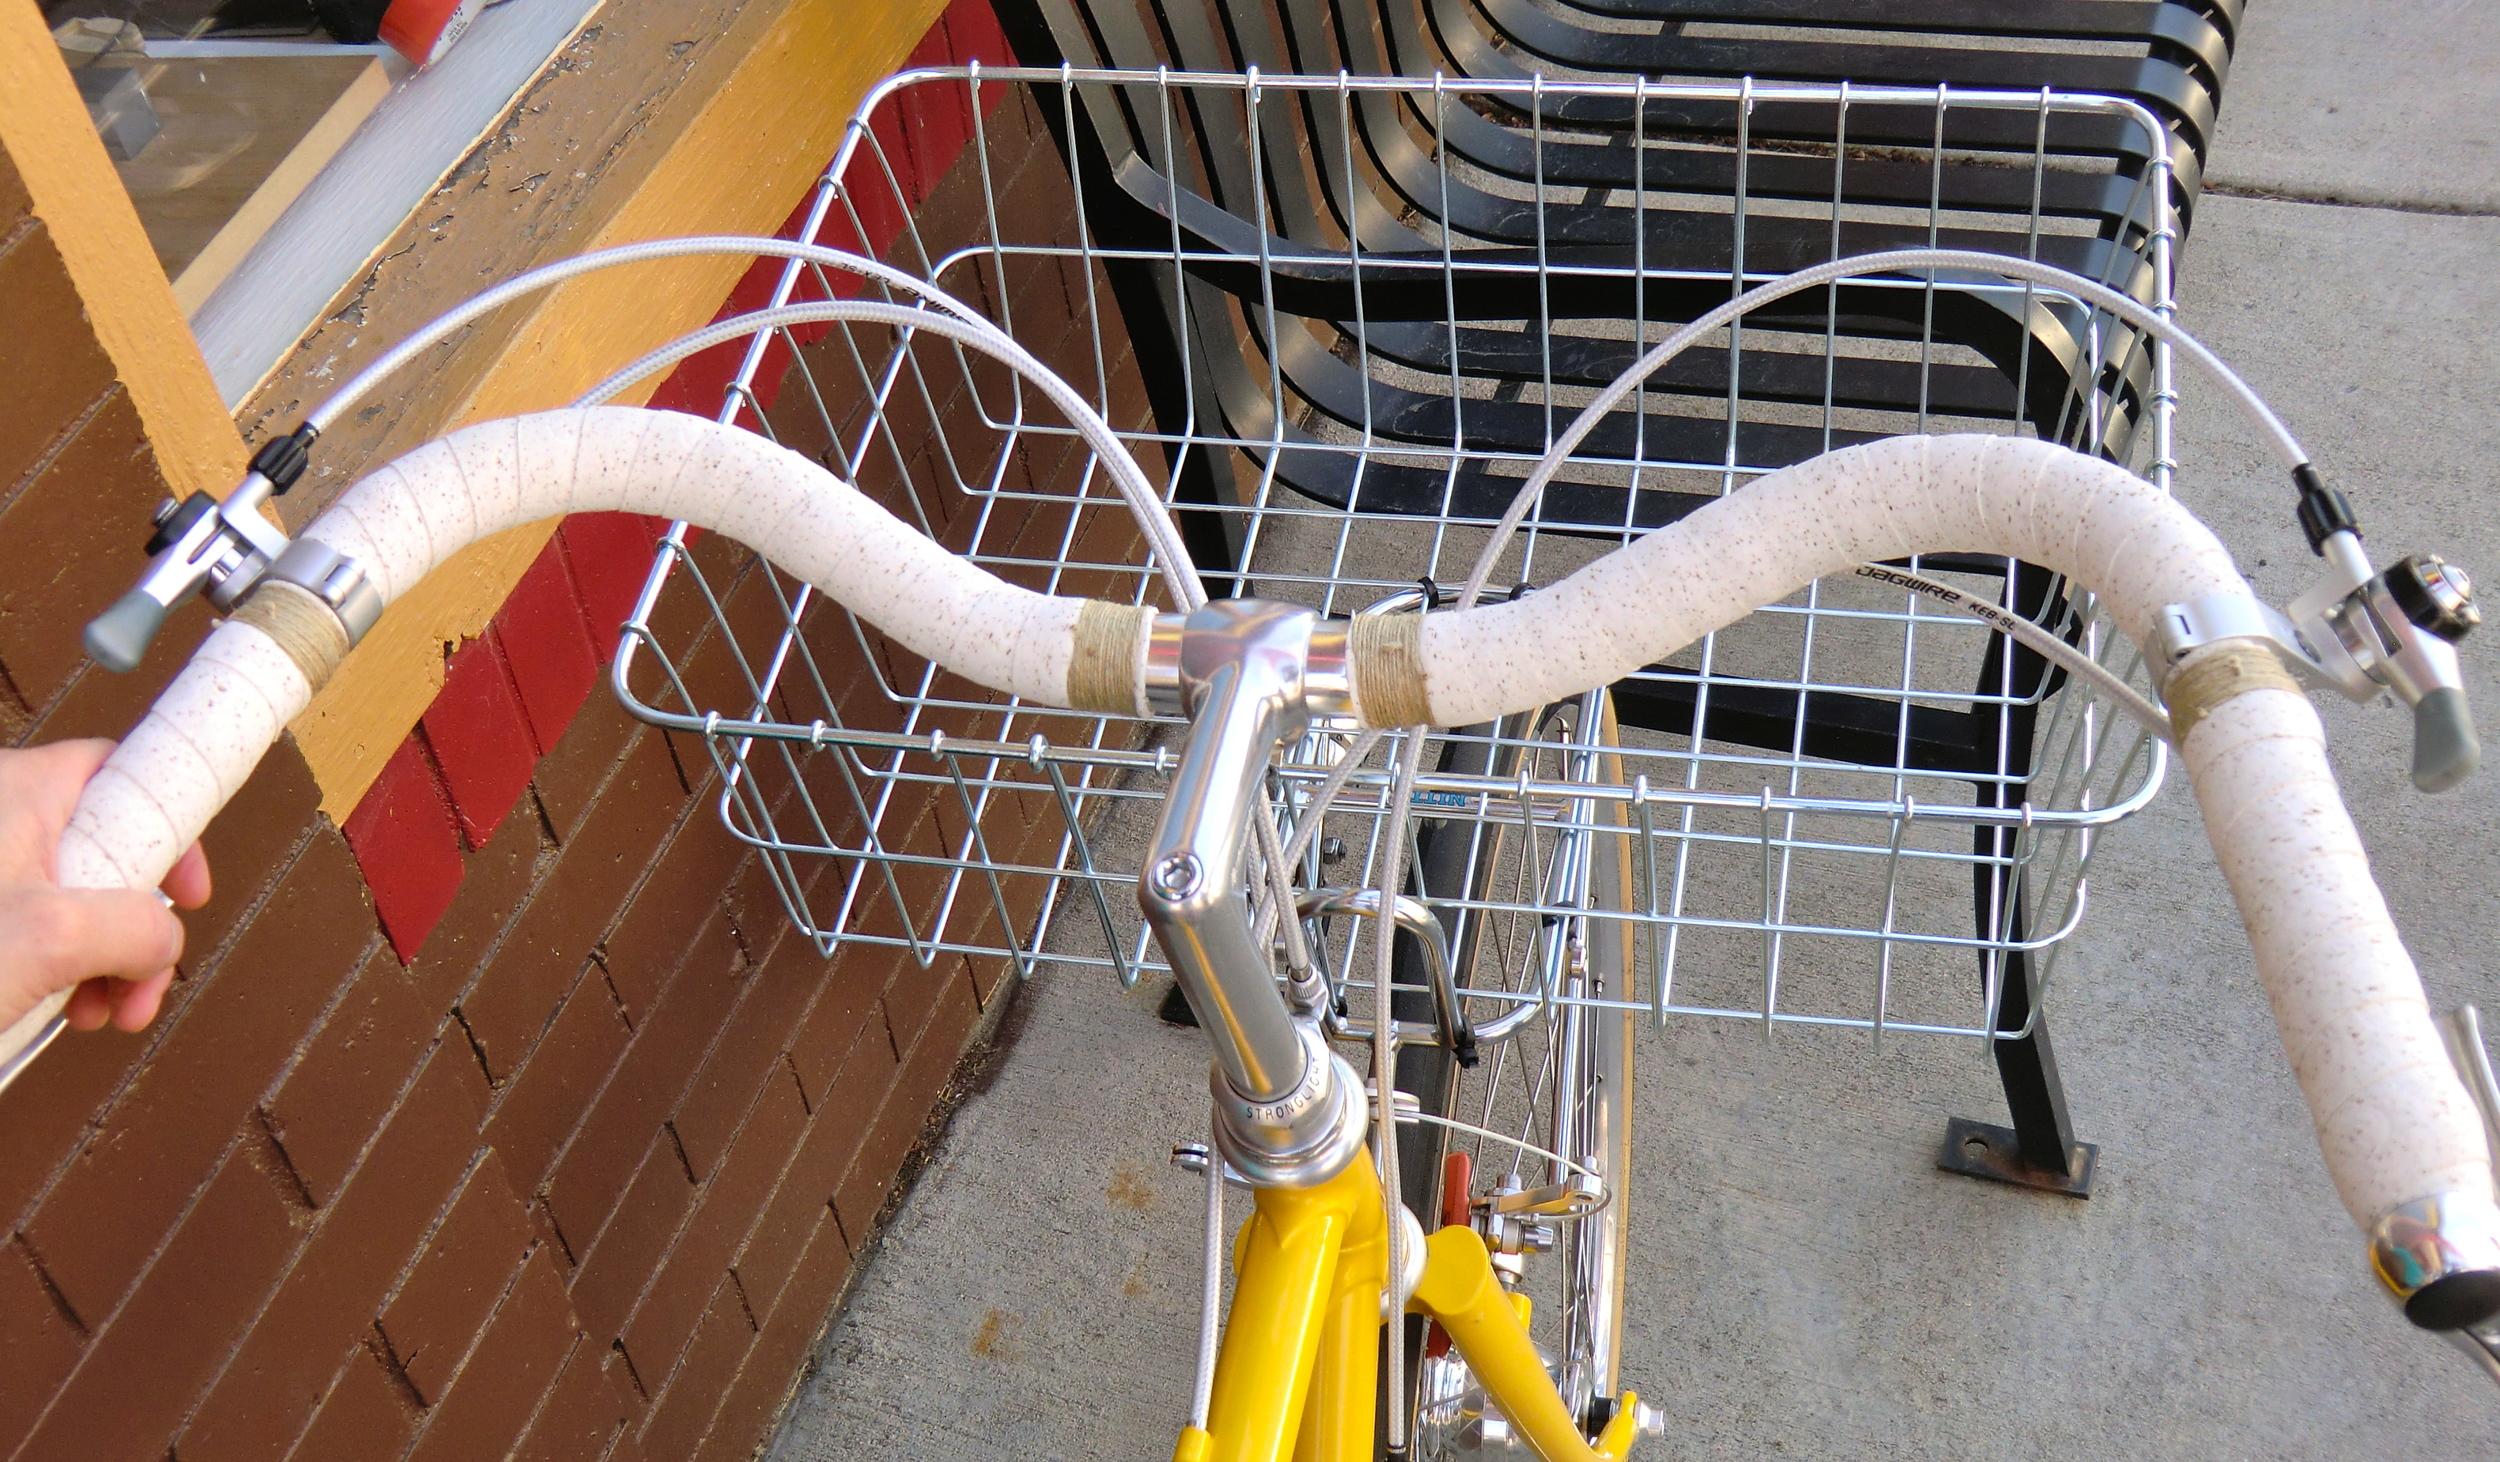 Soma Sparrow Handlebar,  NITTO front rack,  Wald front basket, Cork & Hemp bar wrap, IRD shifters, Jagwire housing